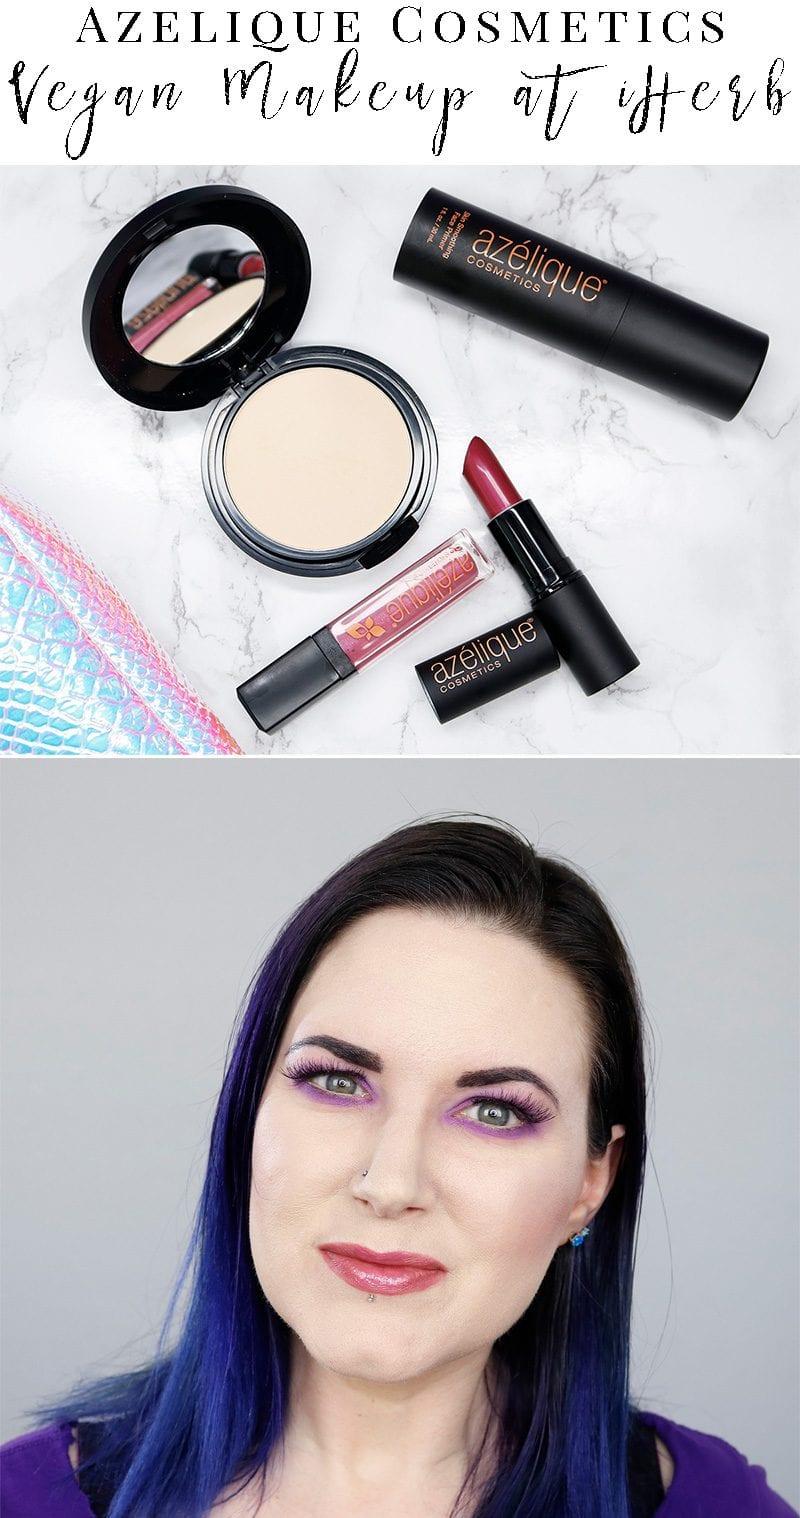 Azelique Cosmetics Launch on iHerb - brand new cruelty-free gluten-free vegan makeup.